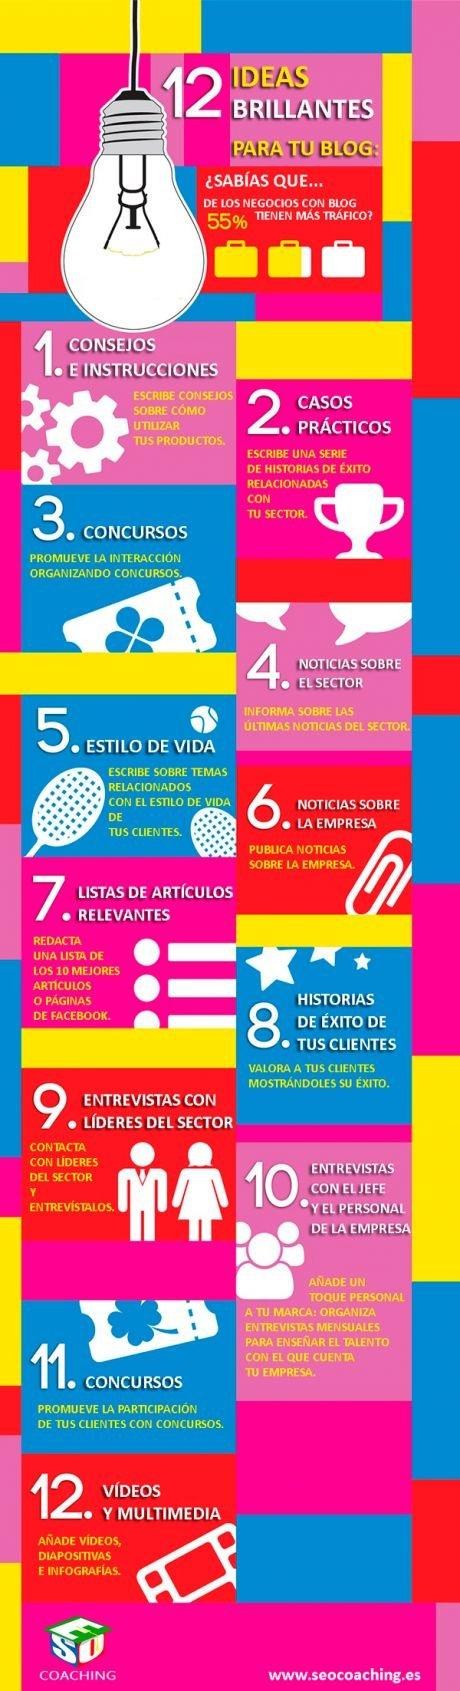 consejos_blog